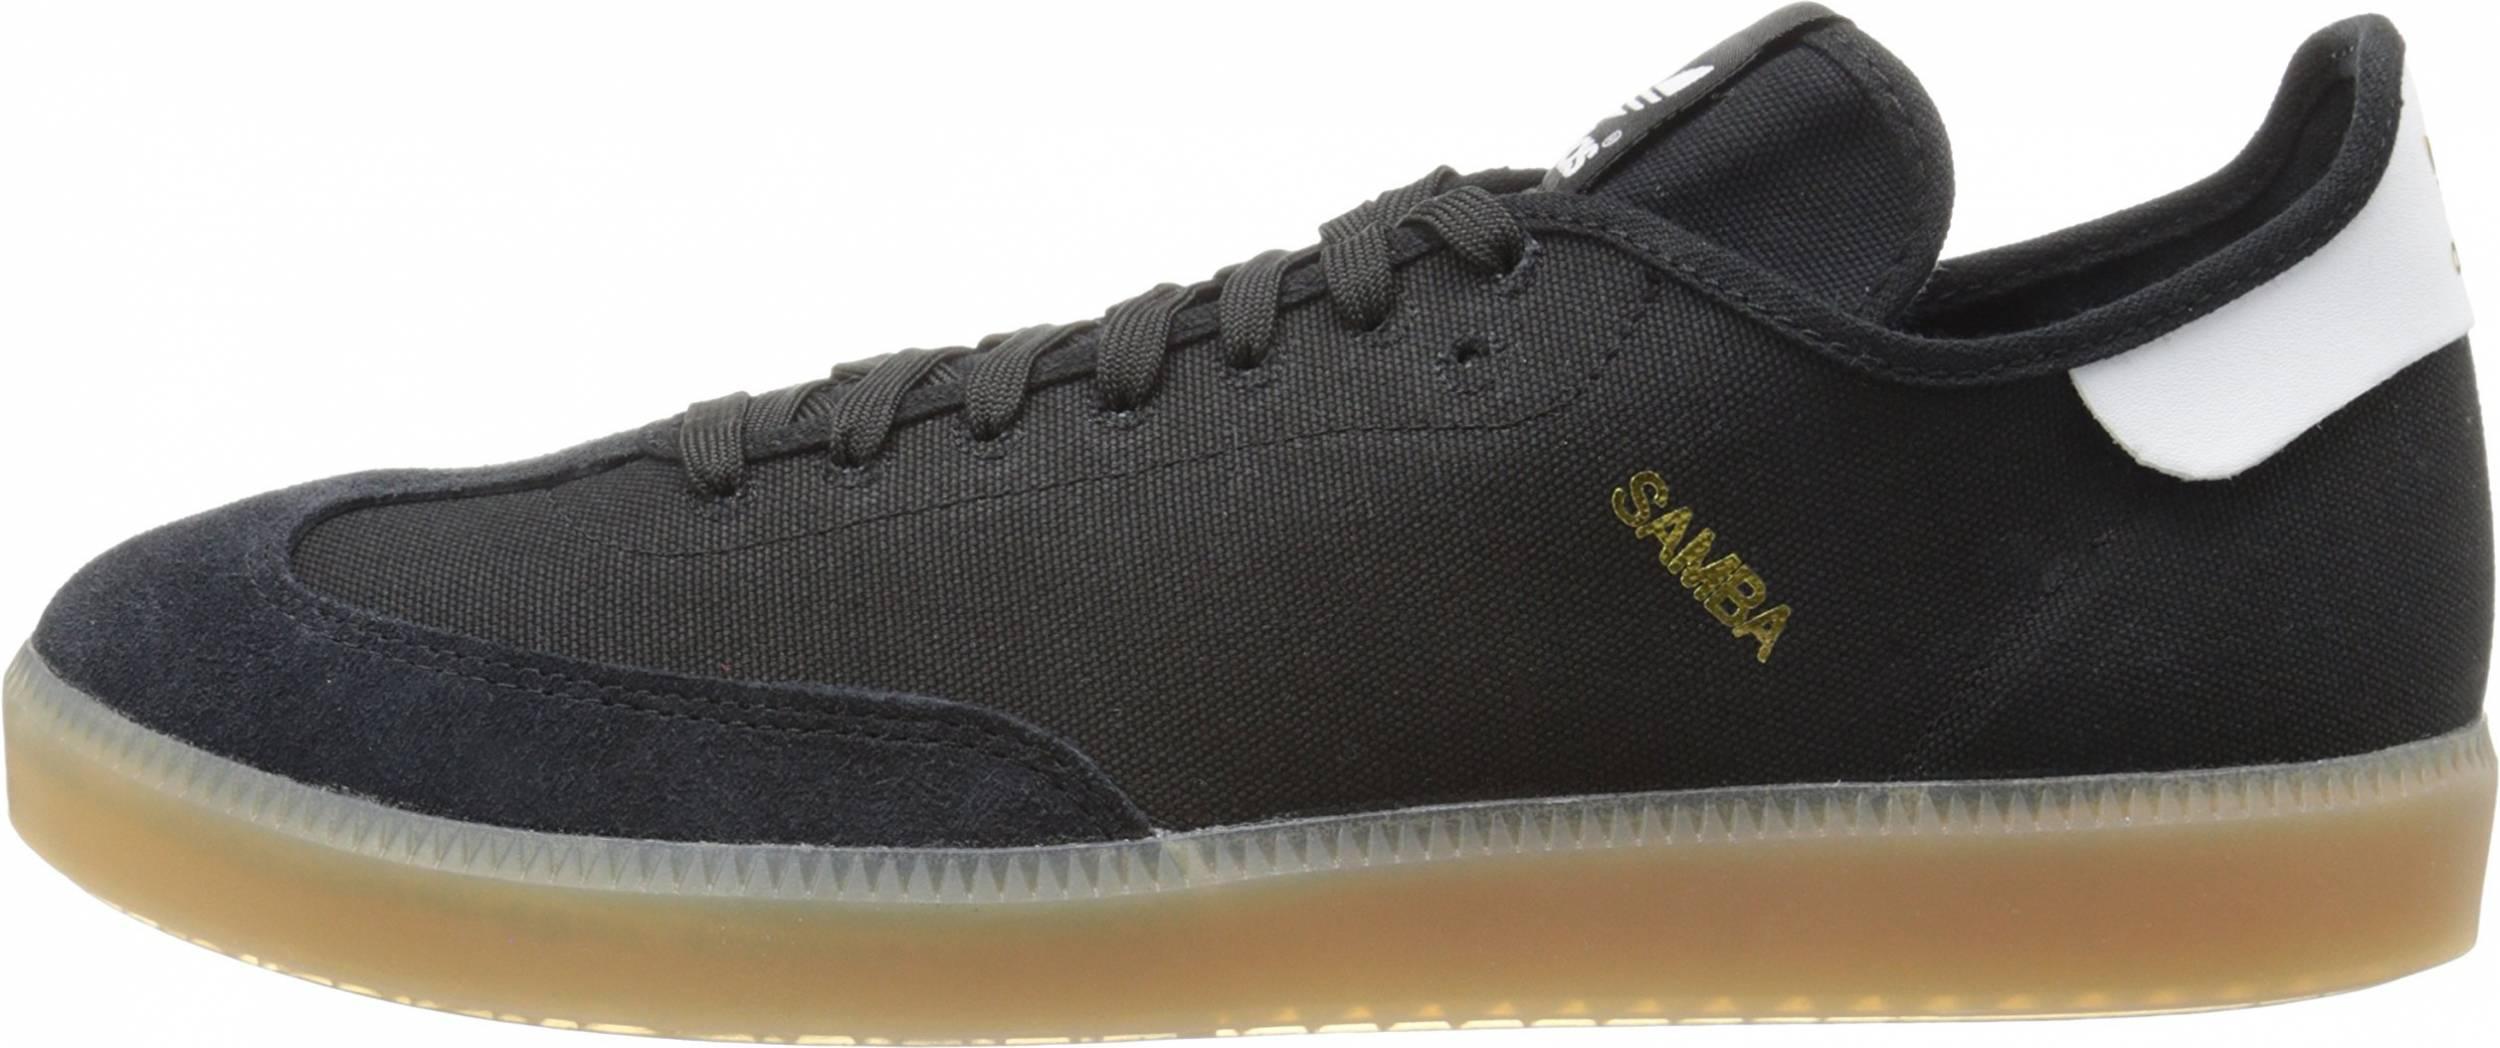 adidas samba tennis shoes